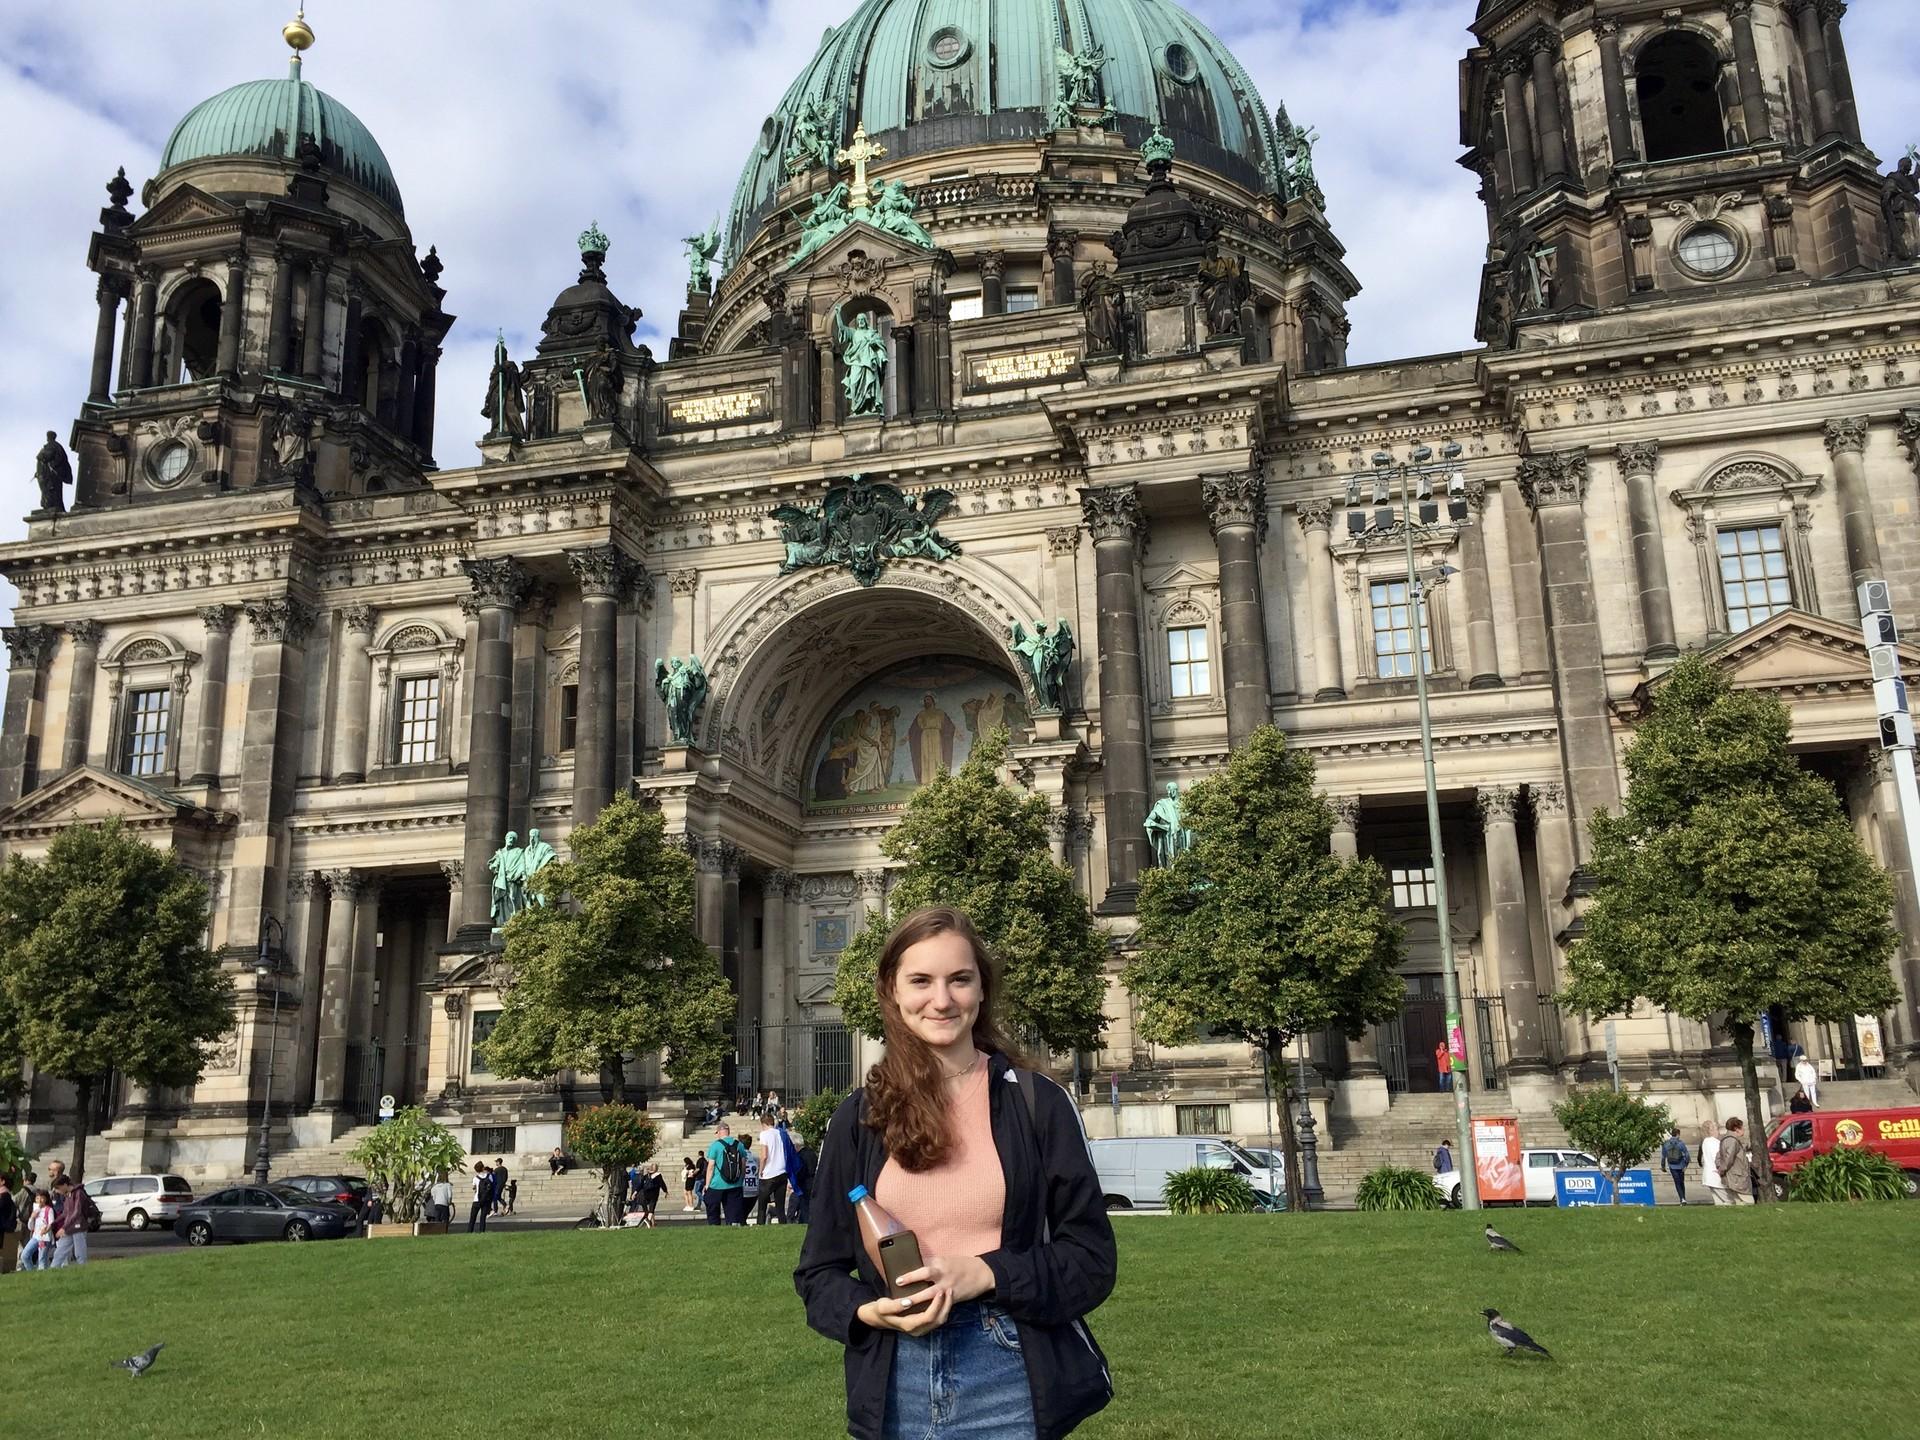 10-things-berlin-summer-8885f52d164db444